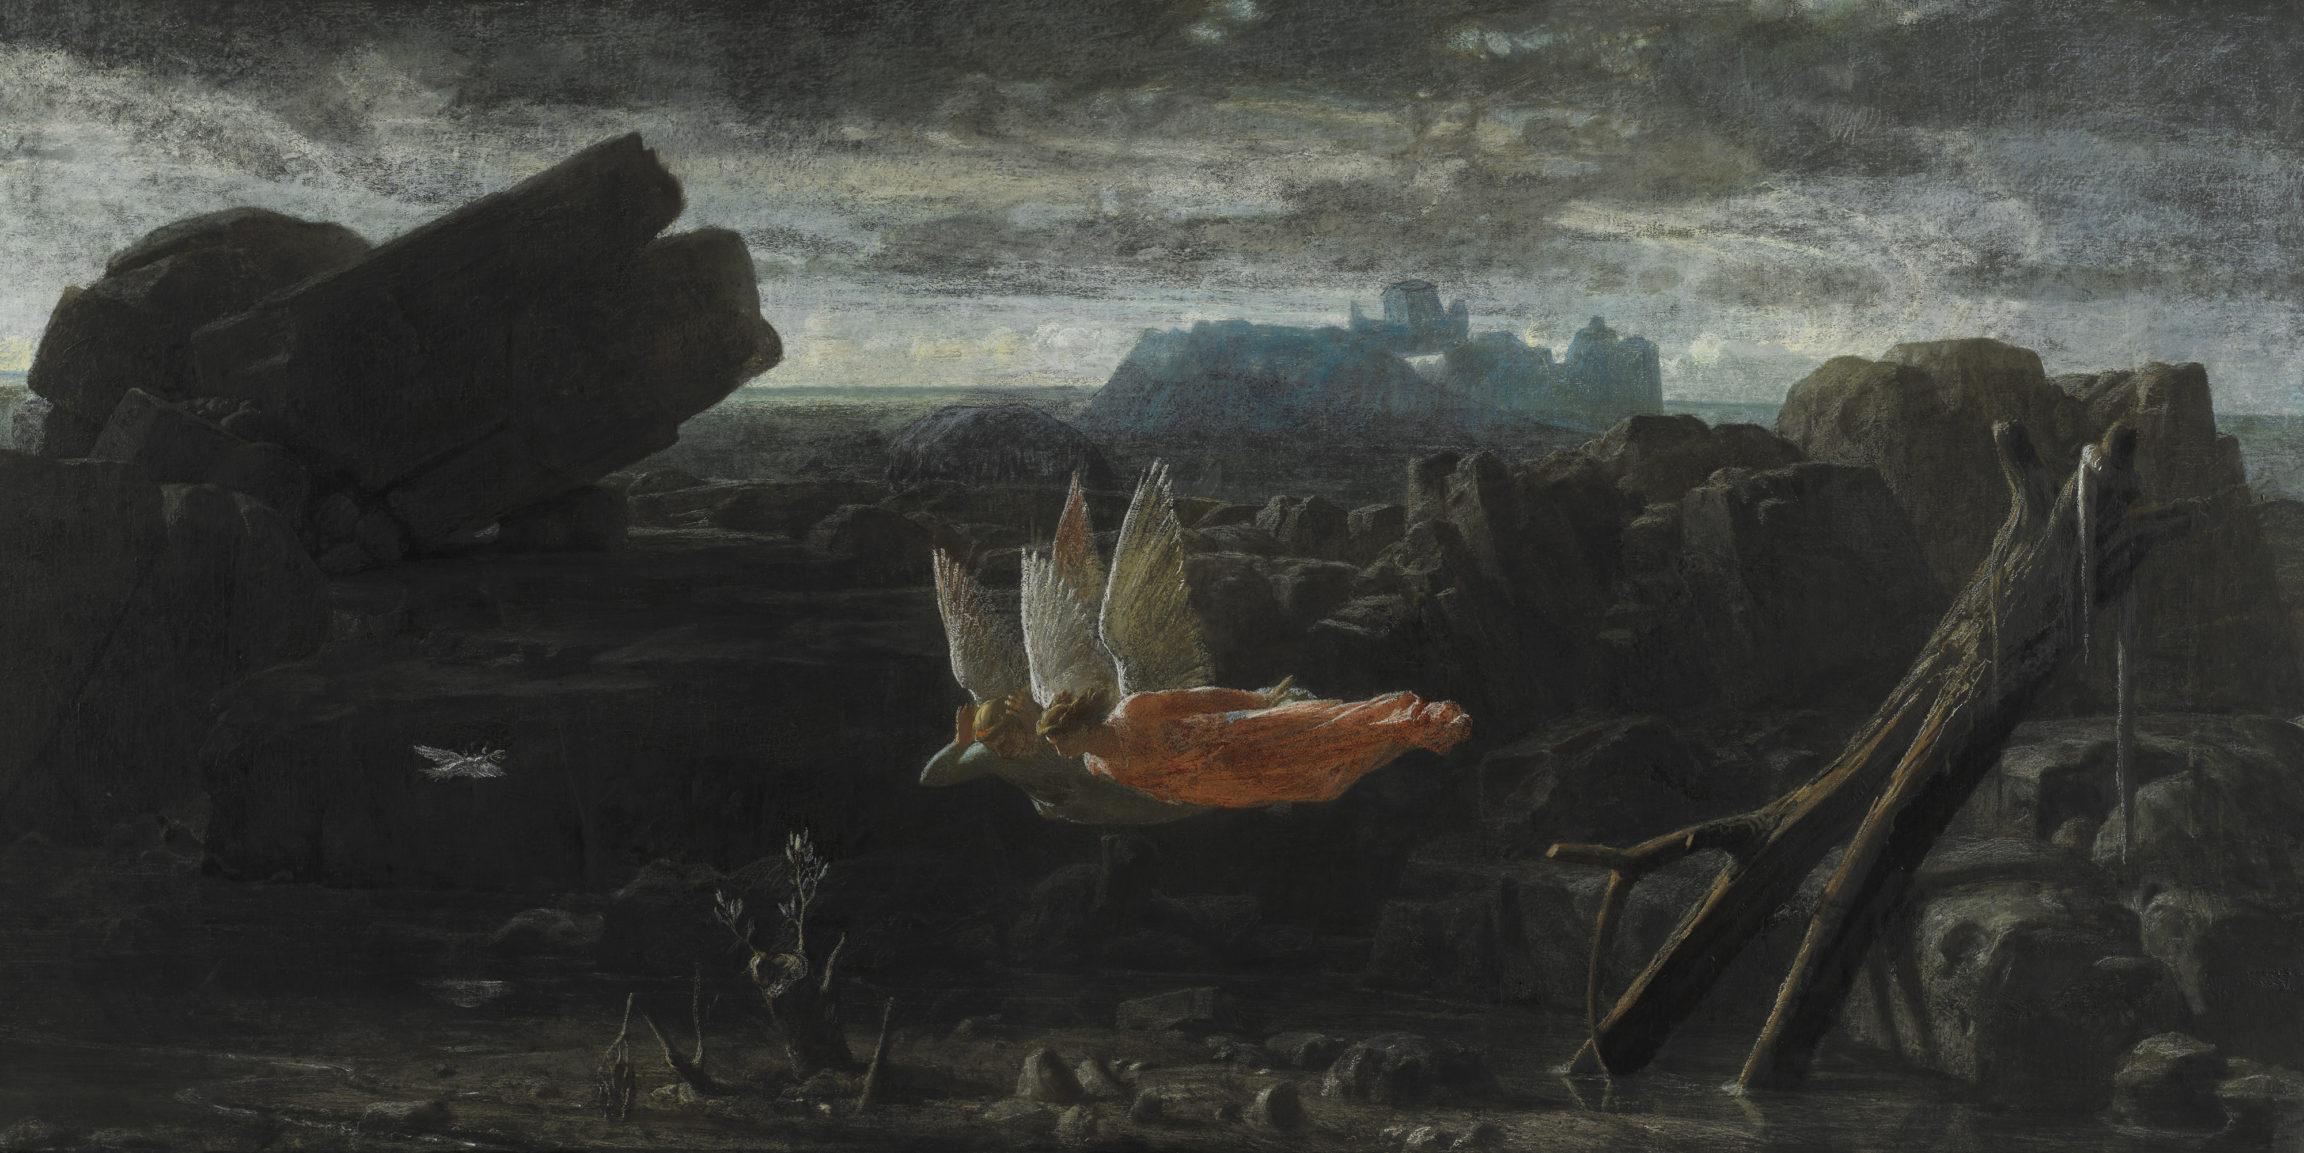 Charles Gleyre, Le Déluge, 1856